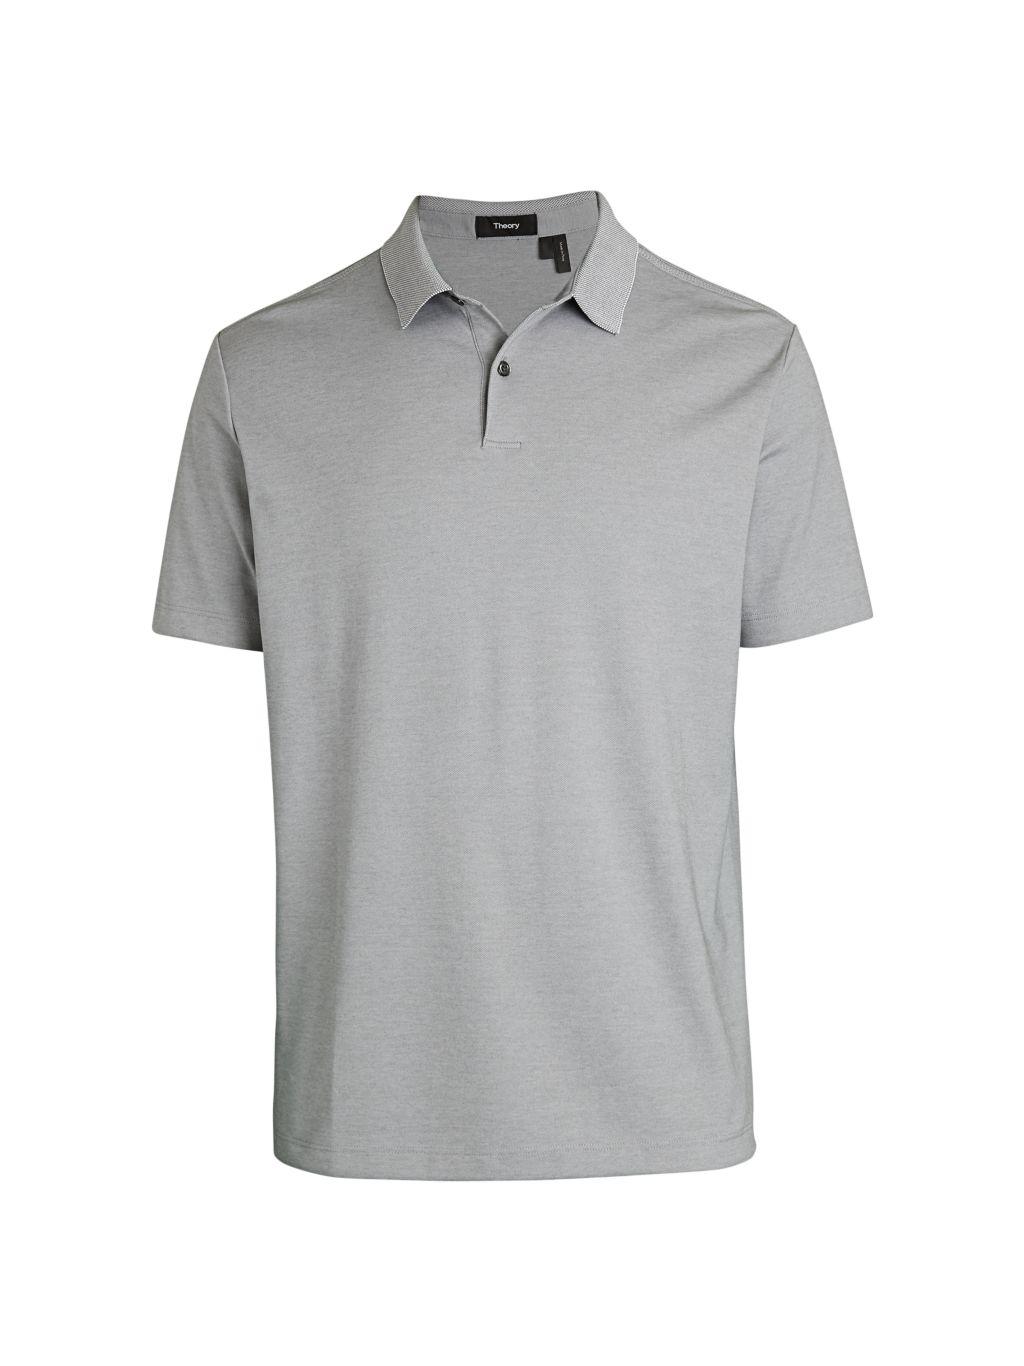 Theory Henley Polo T-Shirt